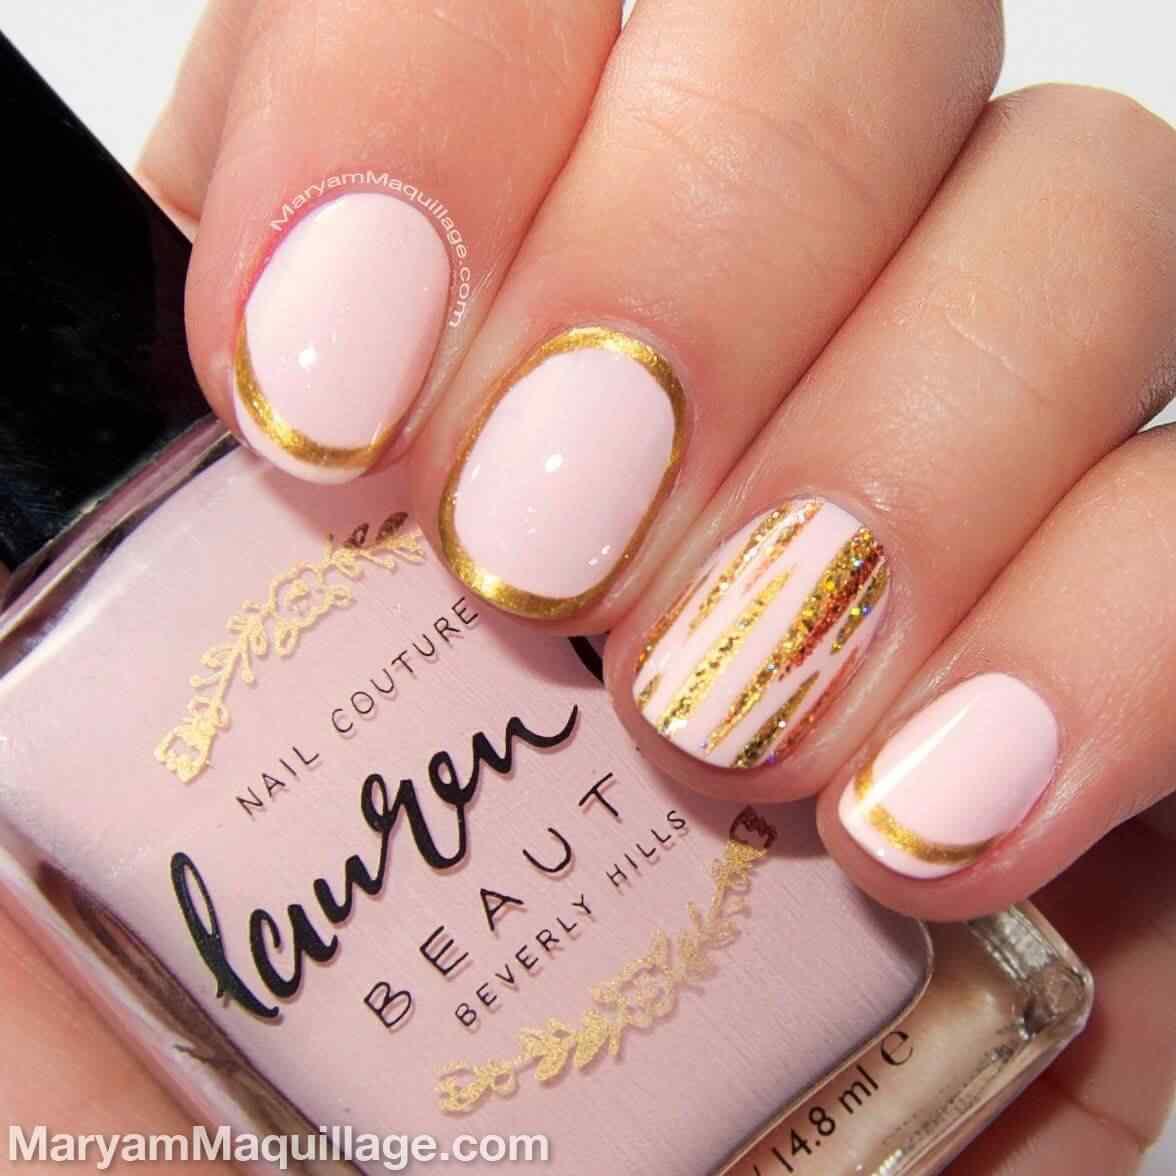 Fuente: http://www.laurenbbeauty.com/blog/spring-beauty-trend-pastel-nailart/